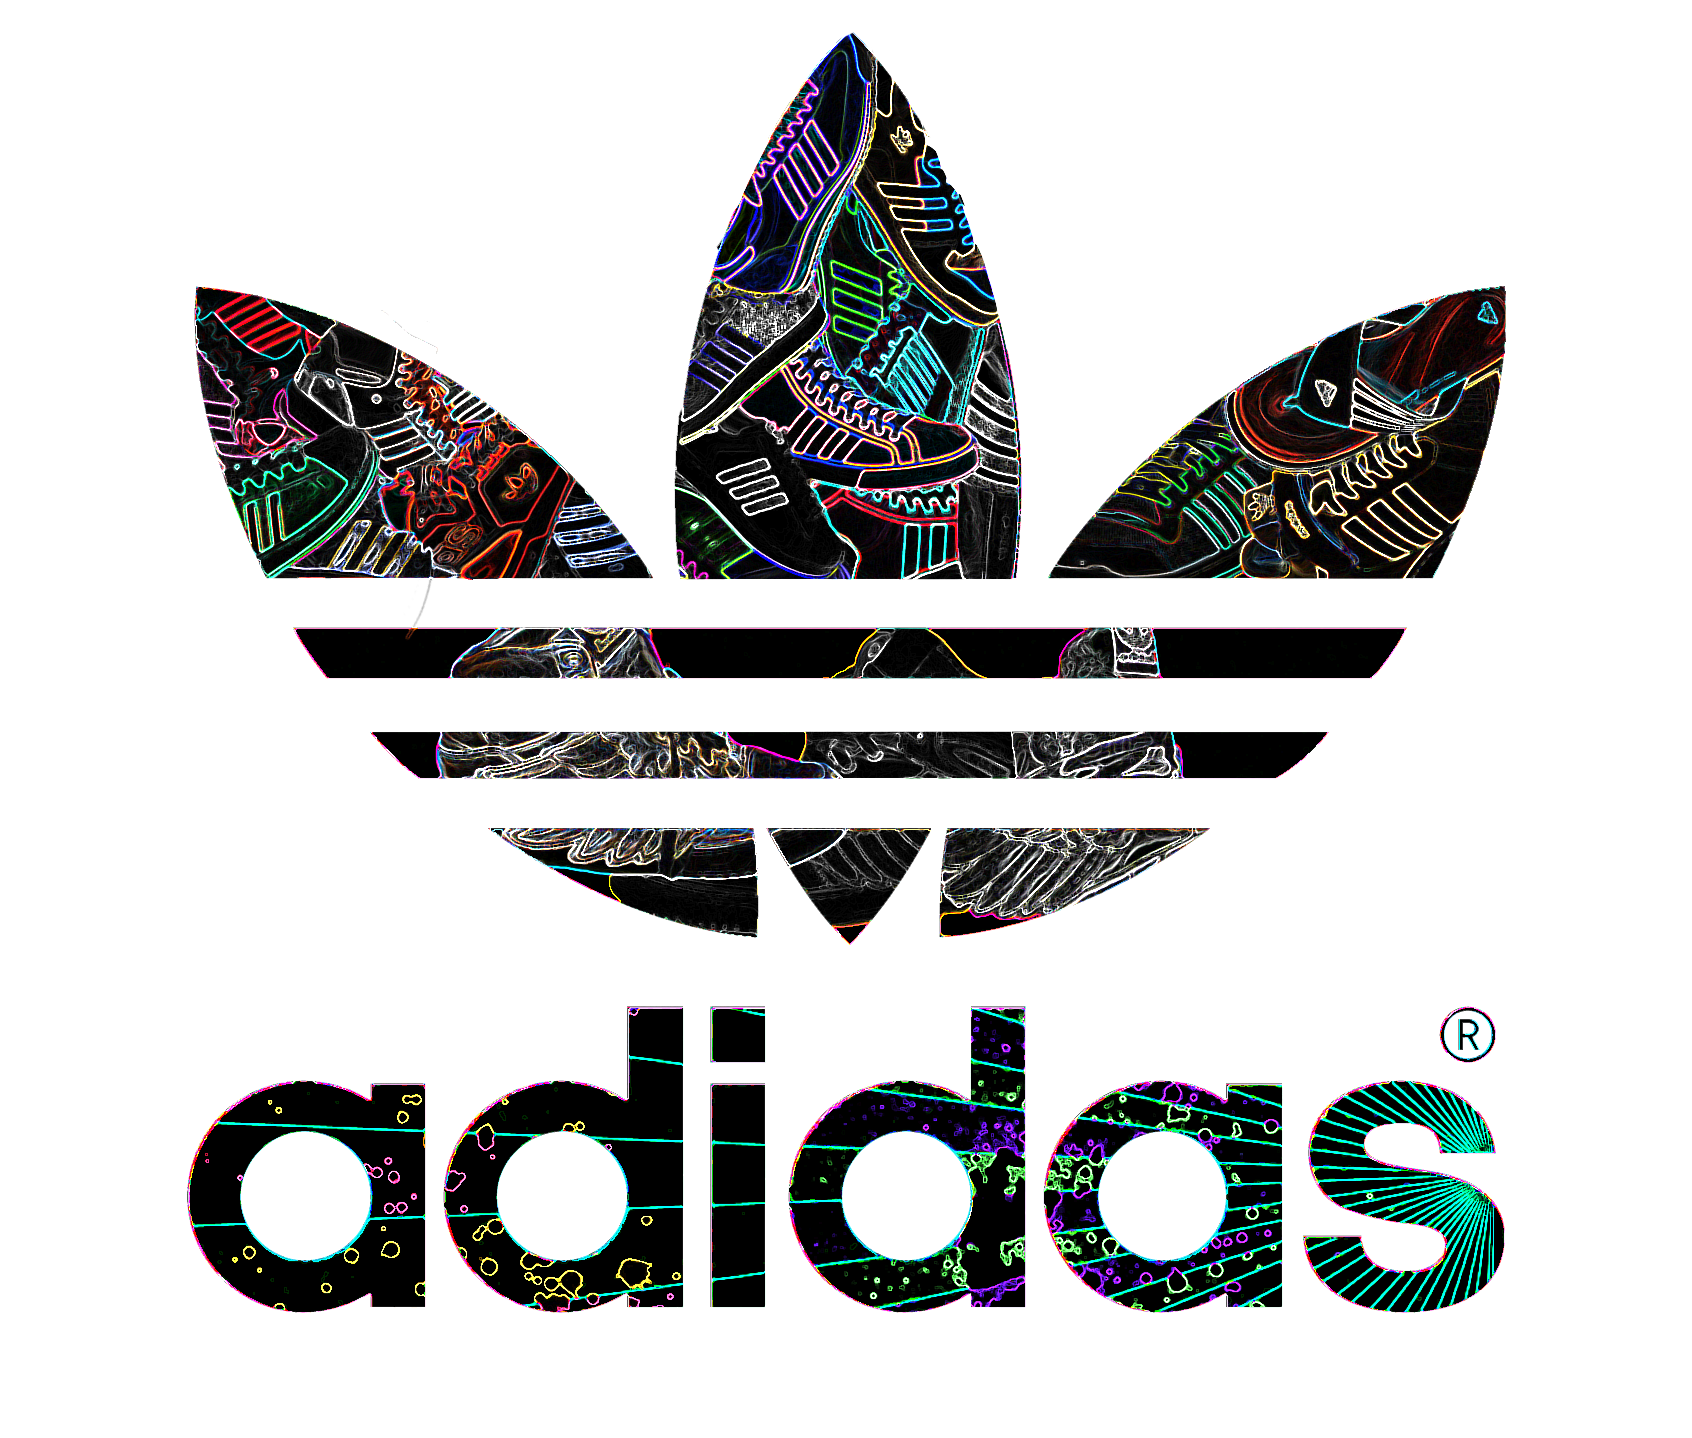 adidas shoes inside the logo by kil3y on deviantart